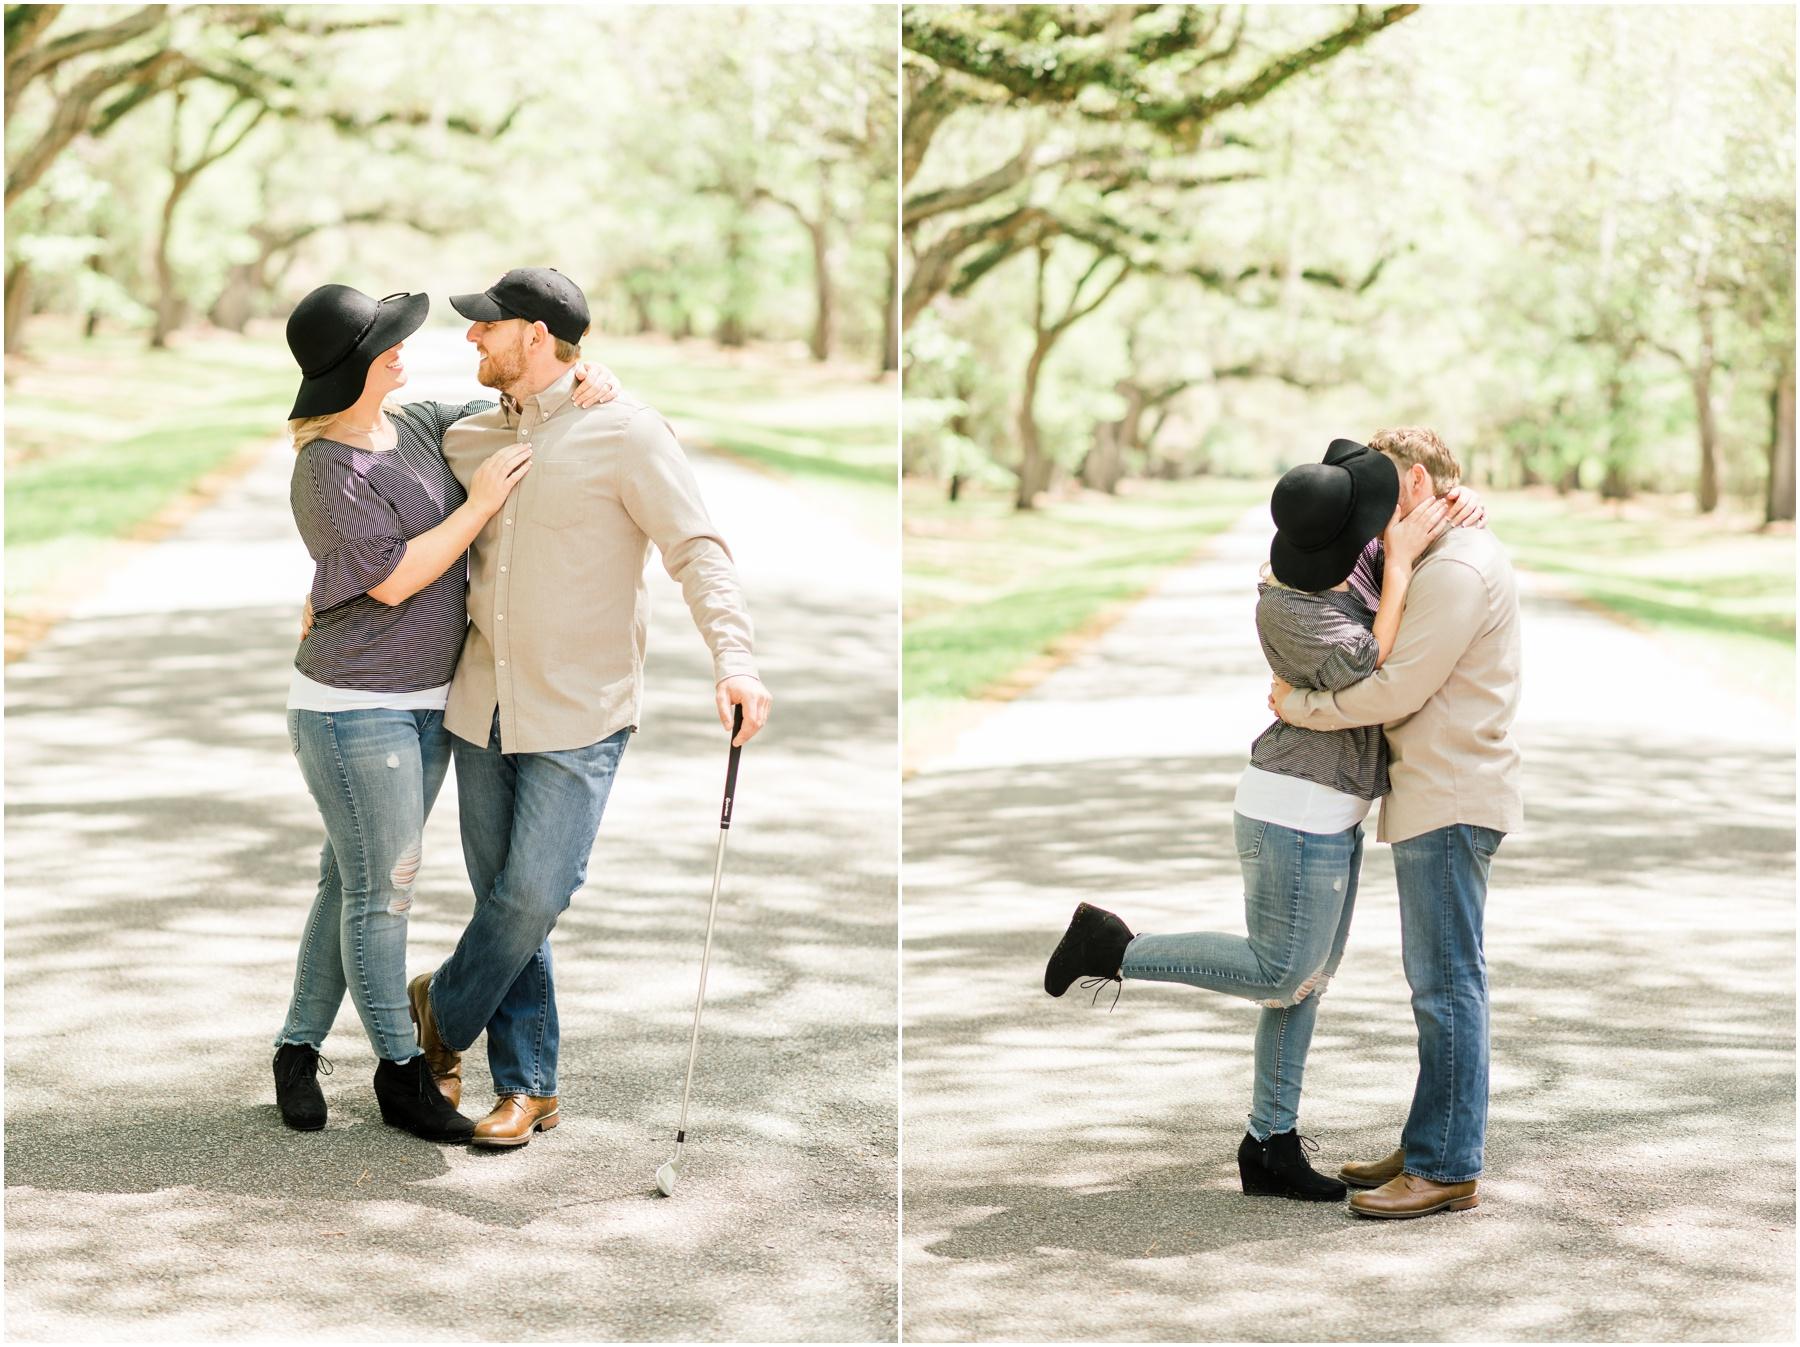 Mepkin-Abbey-Moncks-Corner-South-Carolina-Engagement-Session-Photos_0019.jpg